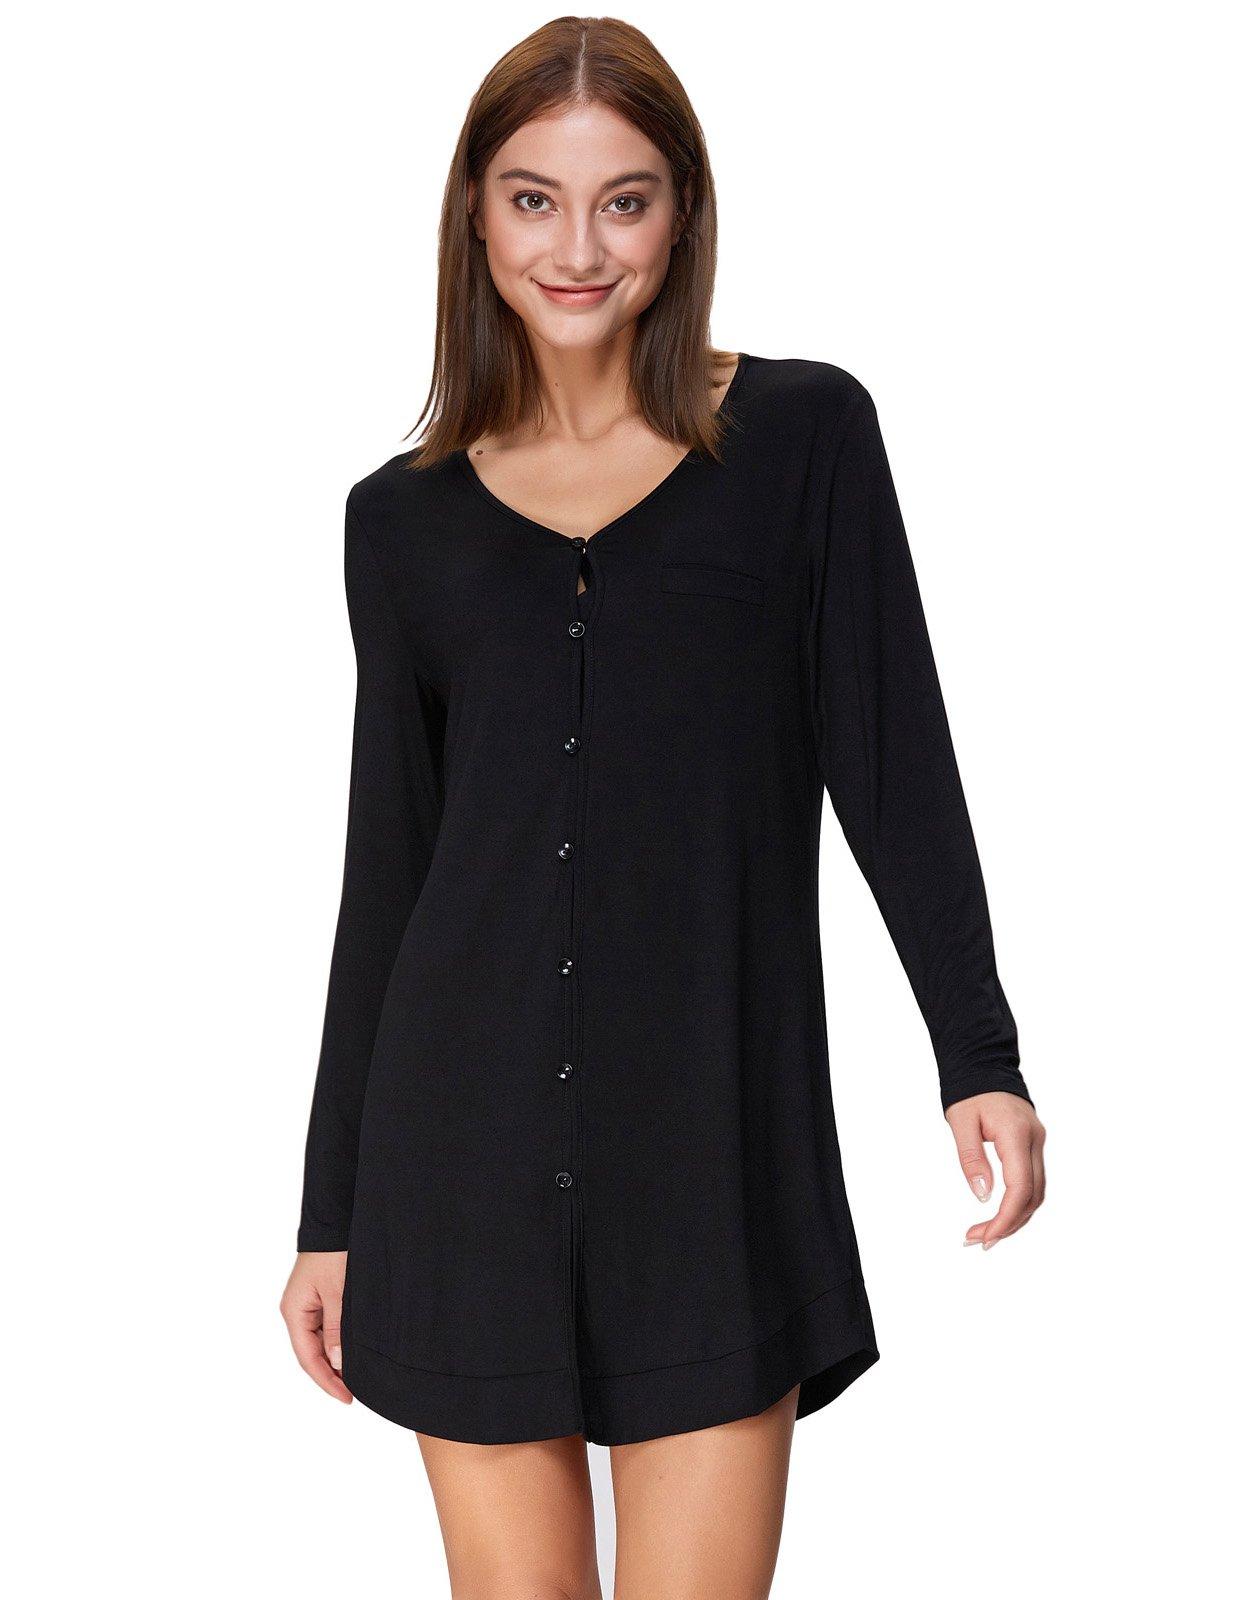 Boyfriend Style Pajama Top Stretchy Mid-Thigh Nightshirt Black Size XL ZE73-1